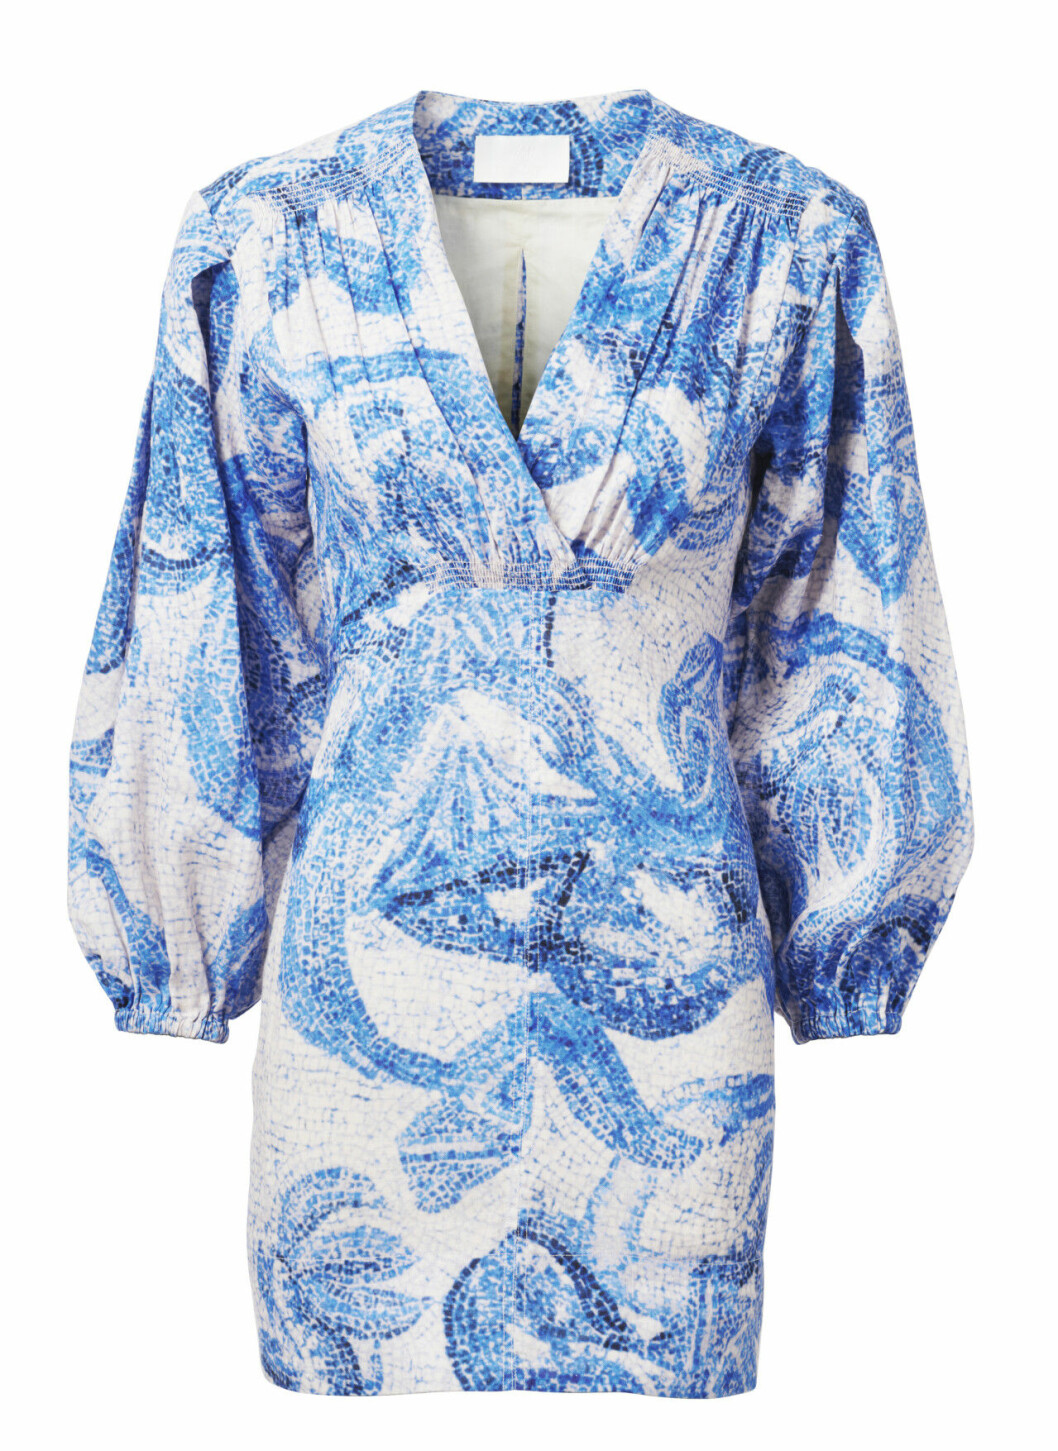 H&M conscious exclusive SS20 – blåvit klänning